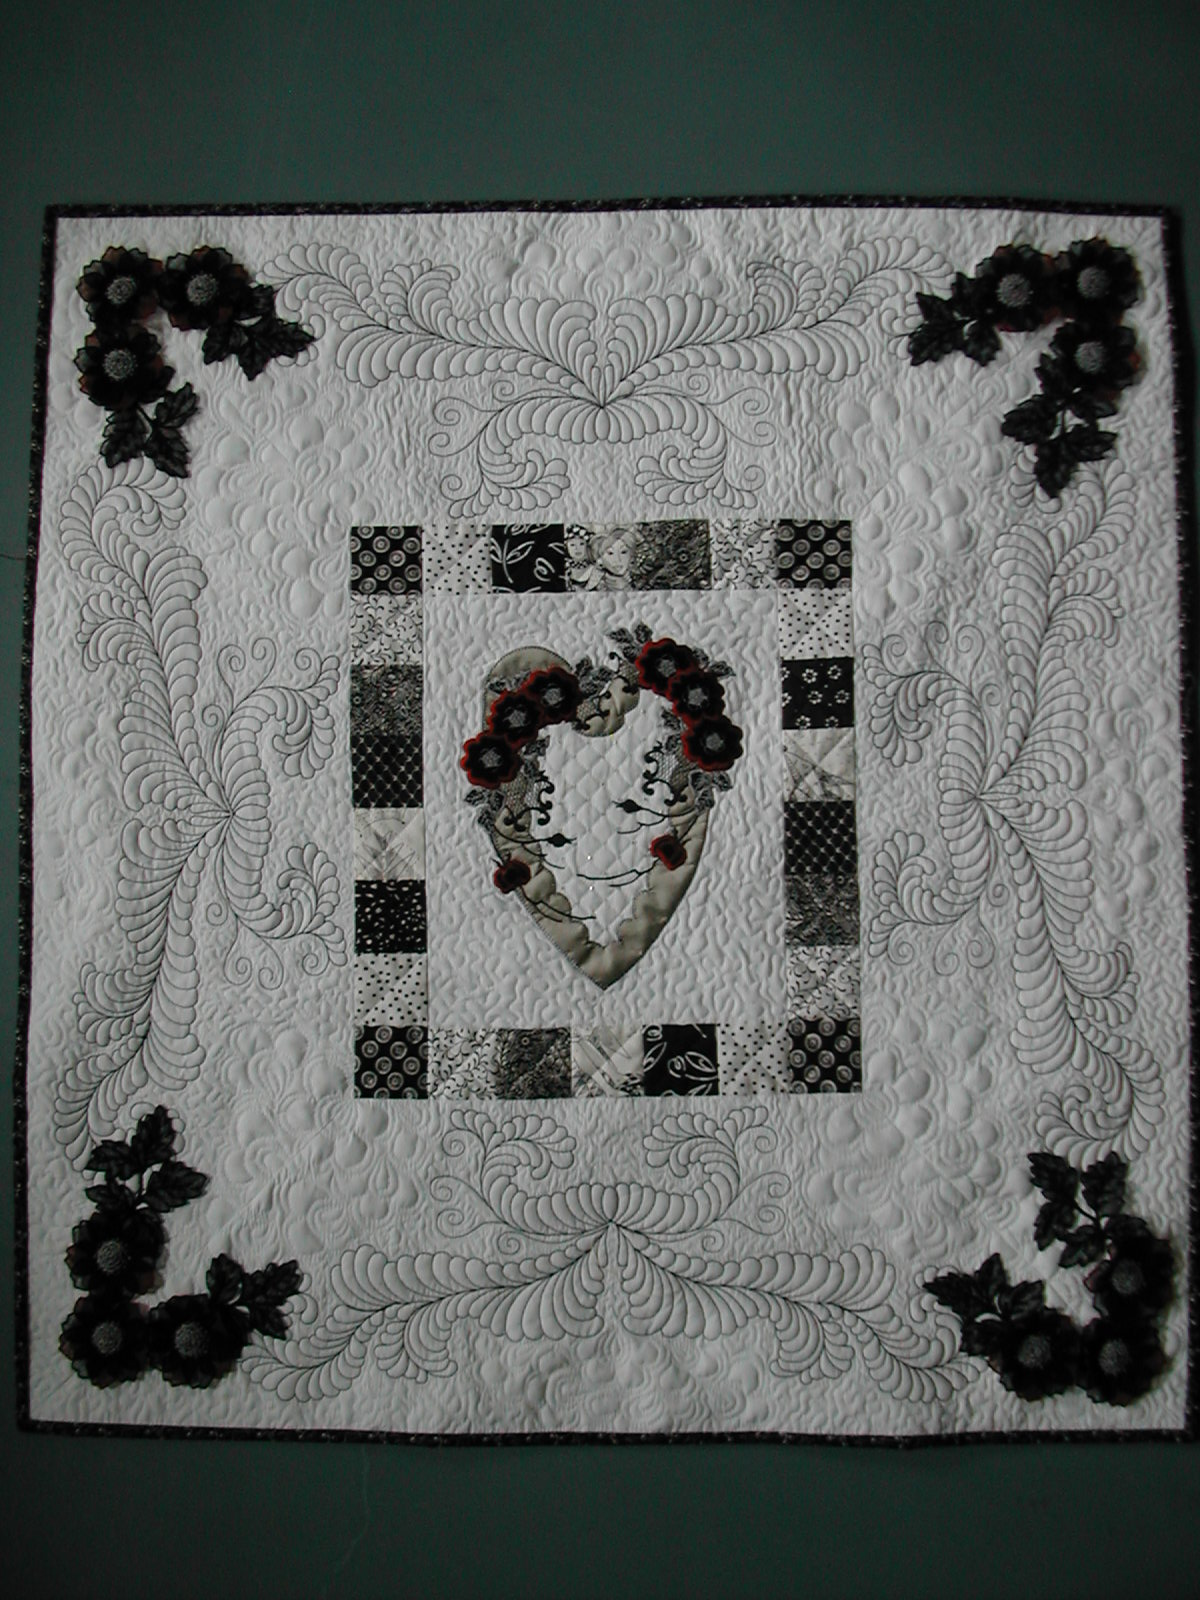 babylock espree embroidery machine model em1